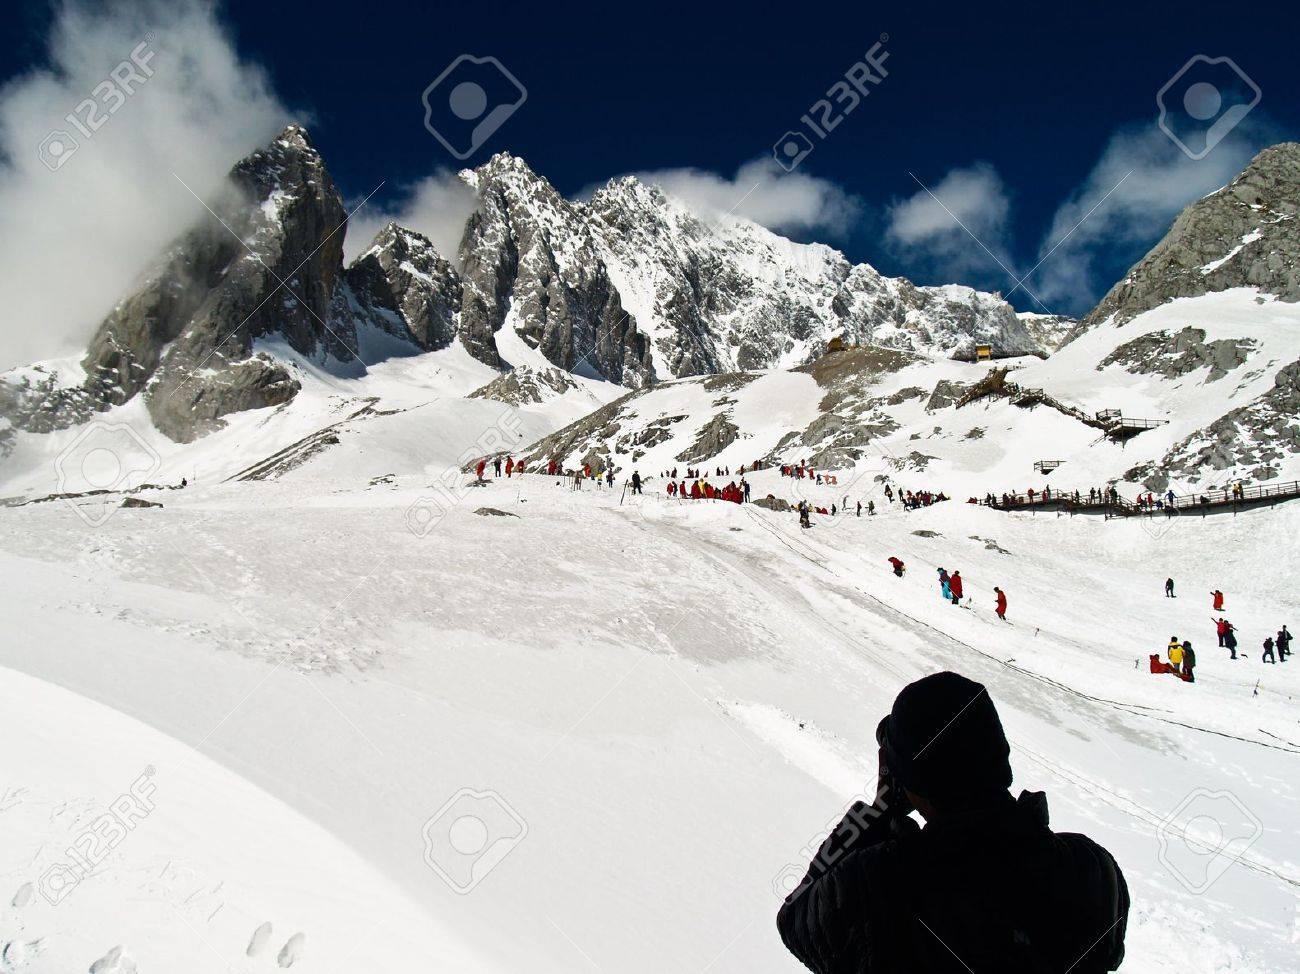 Jade Dragon Snow Mountain in LiJiang, Yunnan Province, China Stock Photo - 13872887